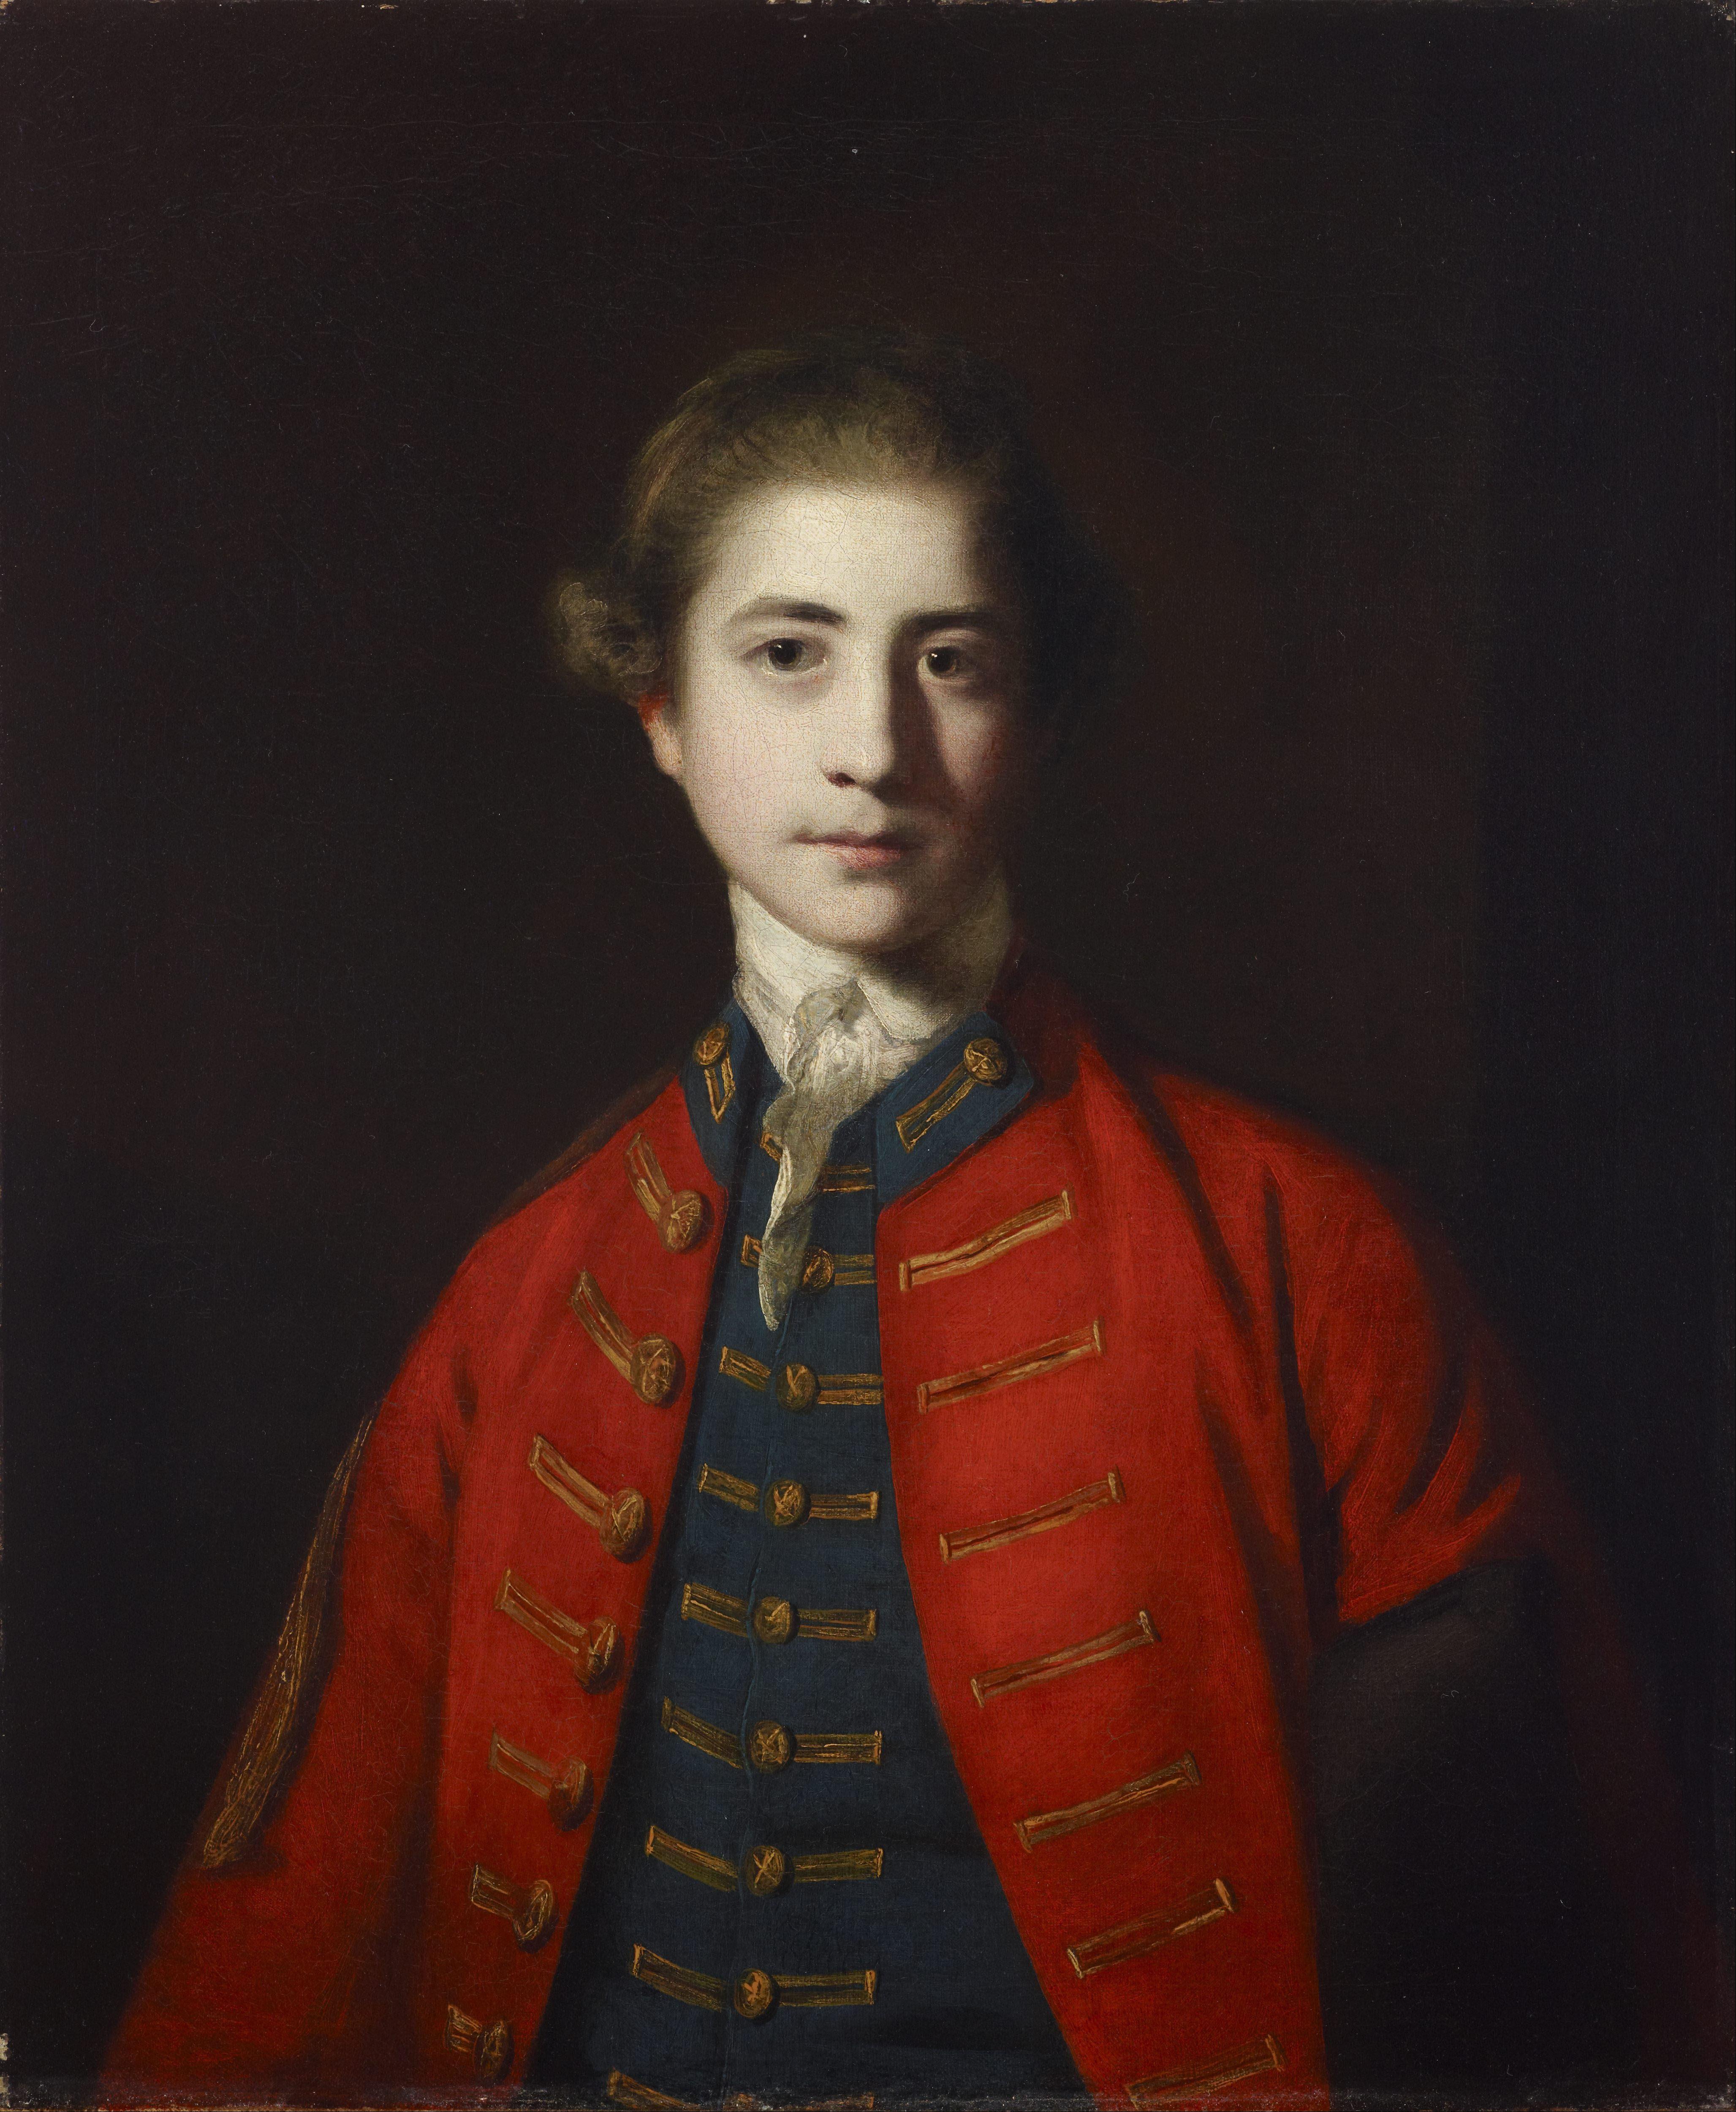 https://upload.wikimedia.org/wikipedia/commons/8/81/Sir_Joshua_Reynolds_-_Stephen_Croft%2C_Junior_-_Google_Art_Project.jpg